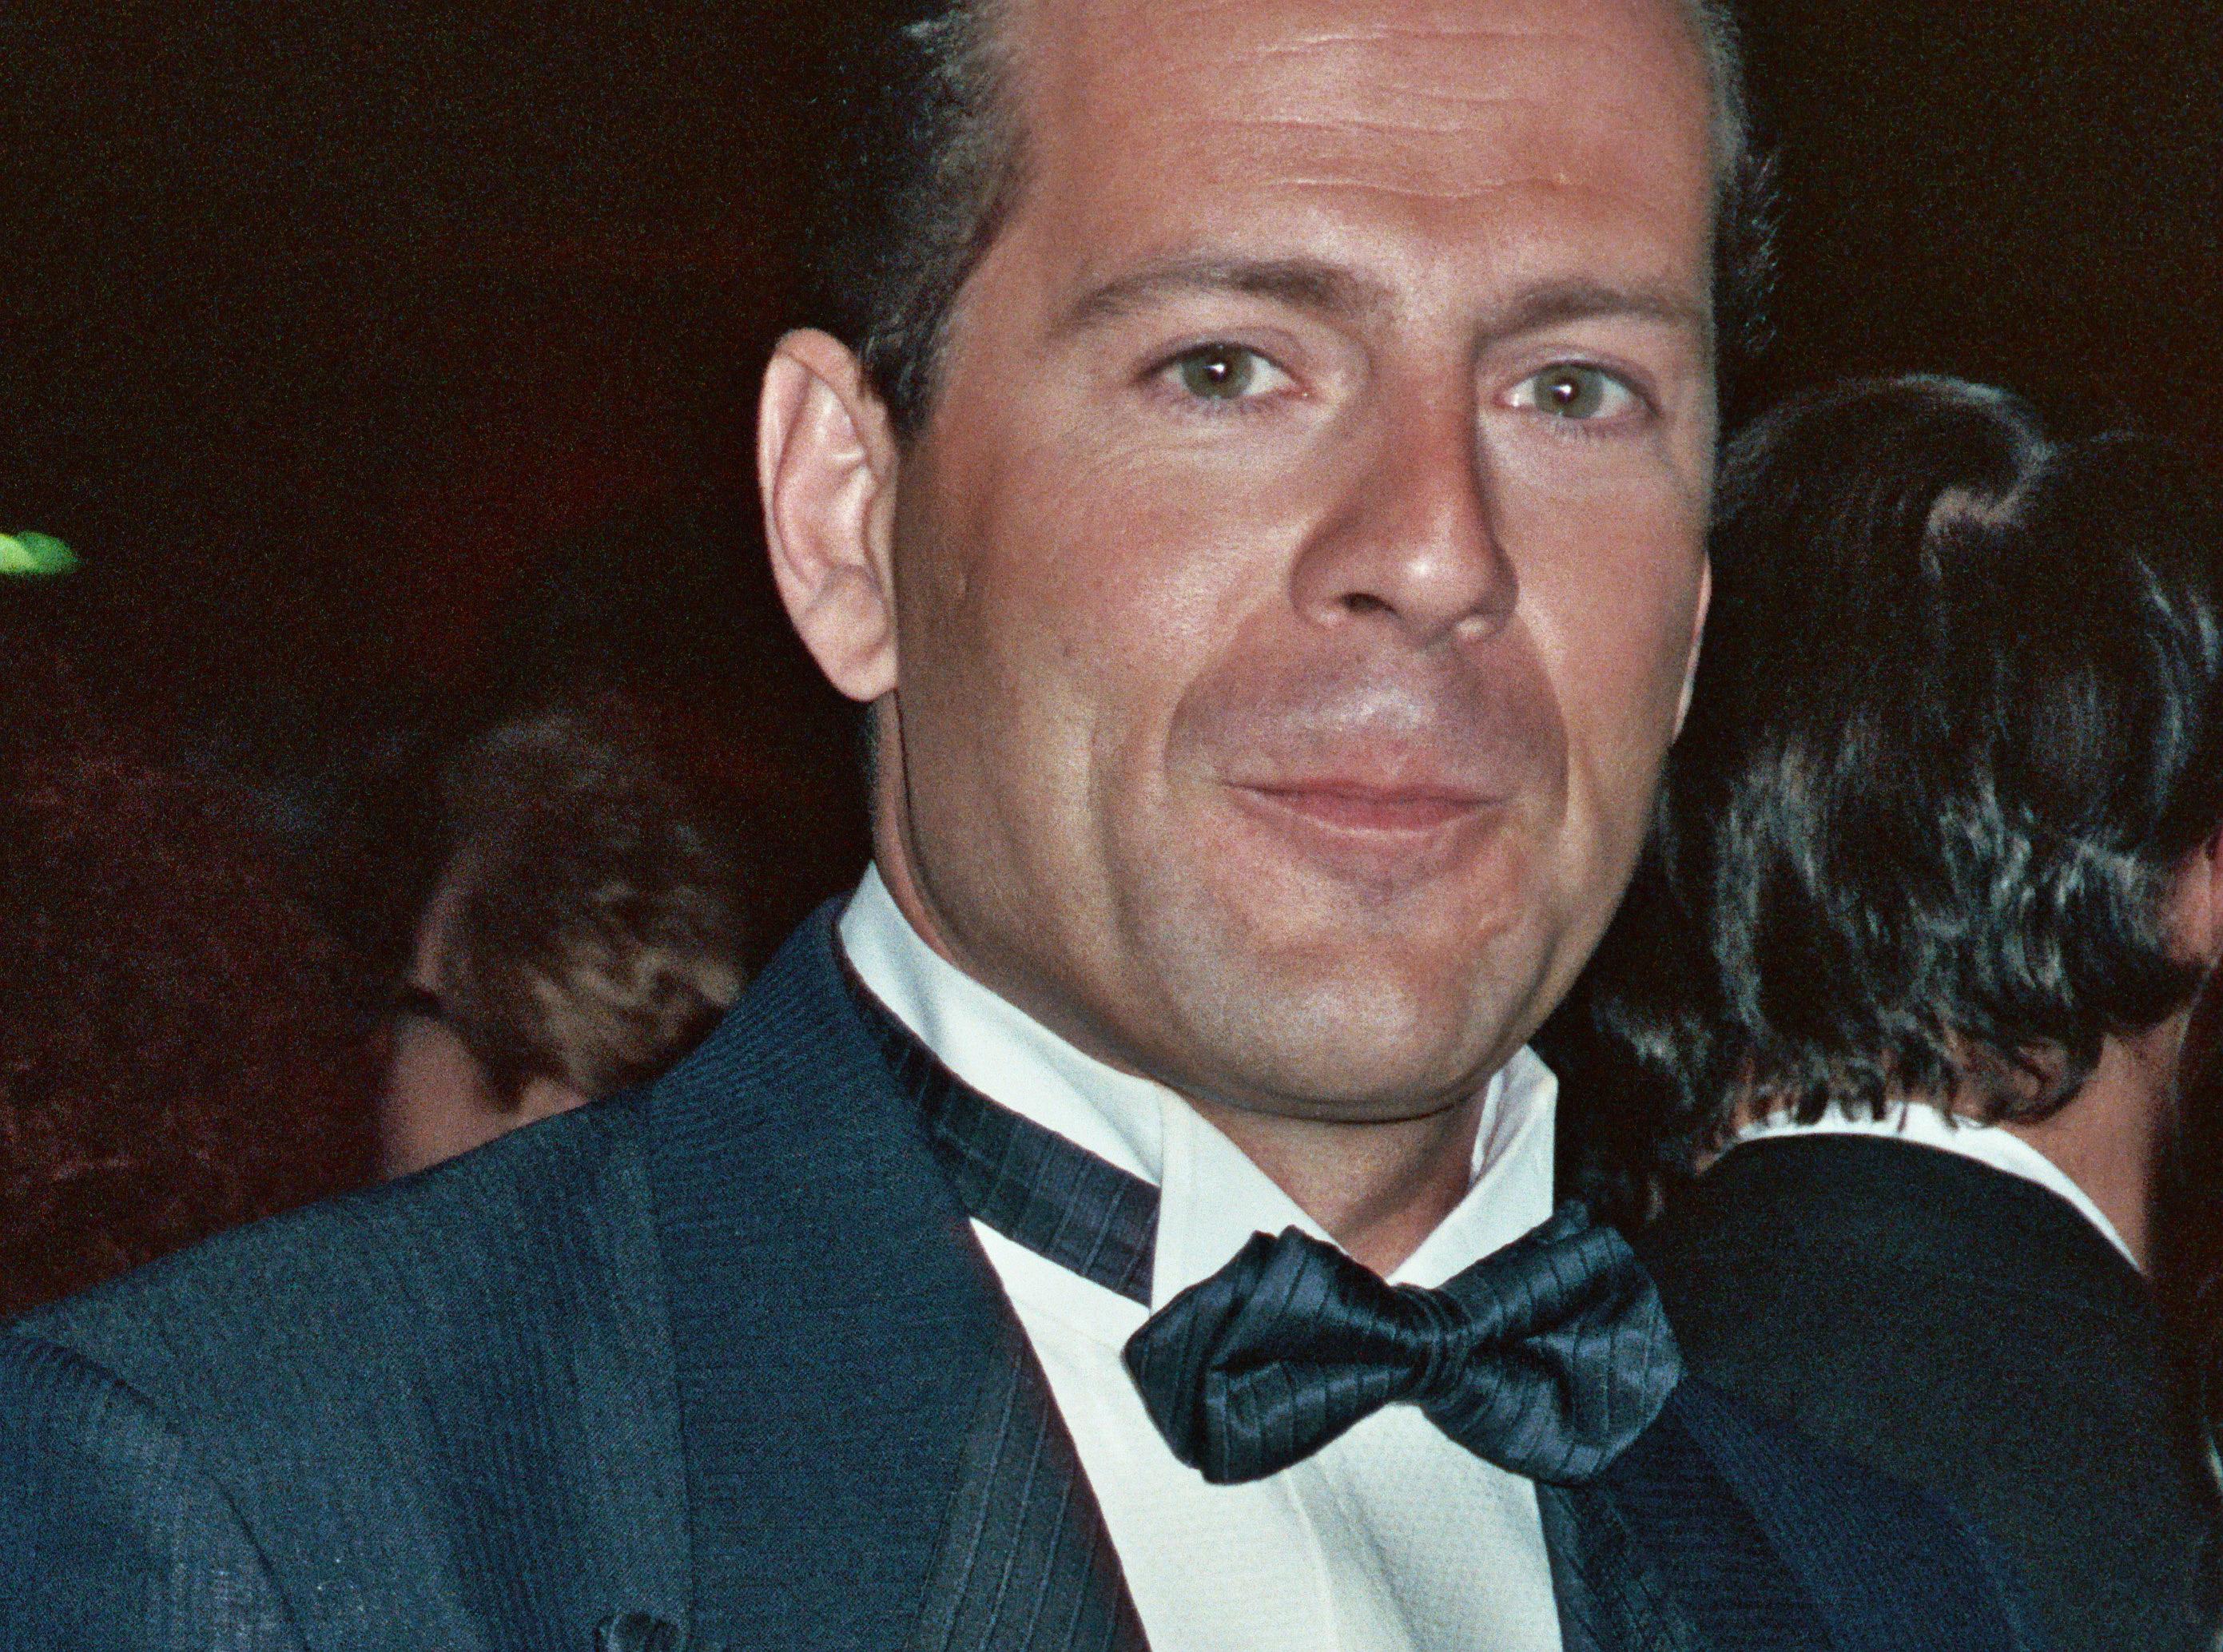 Image:Bruce Willis beautiful wallpaper 1989.jpg ... beautiful wallpaper